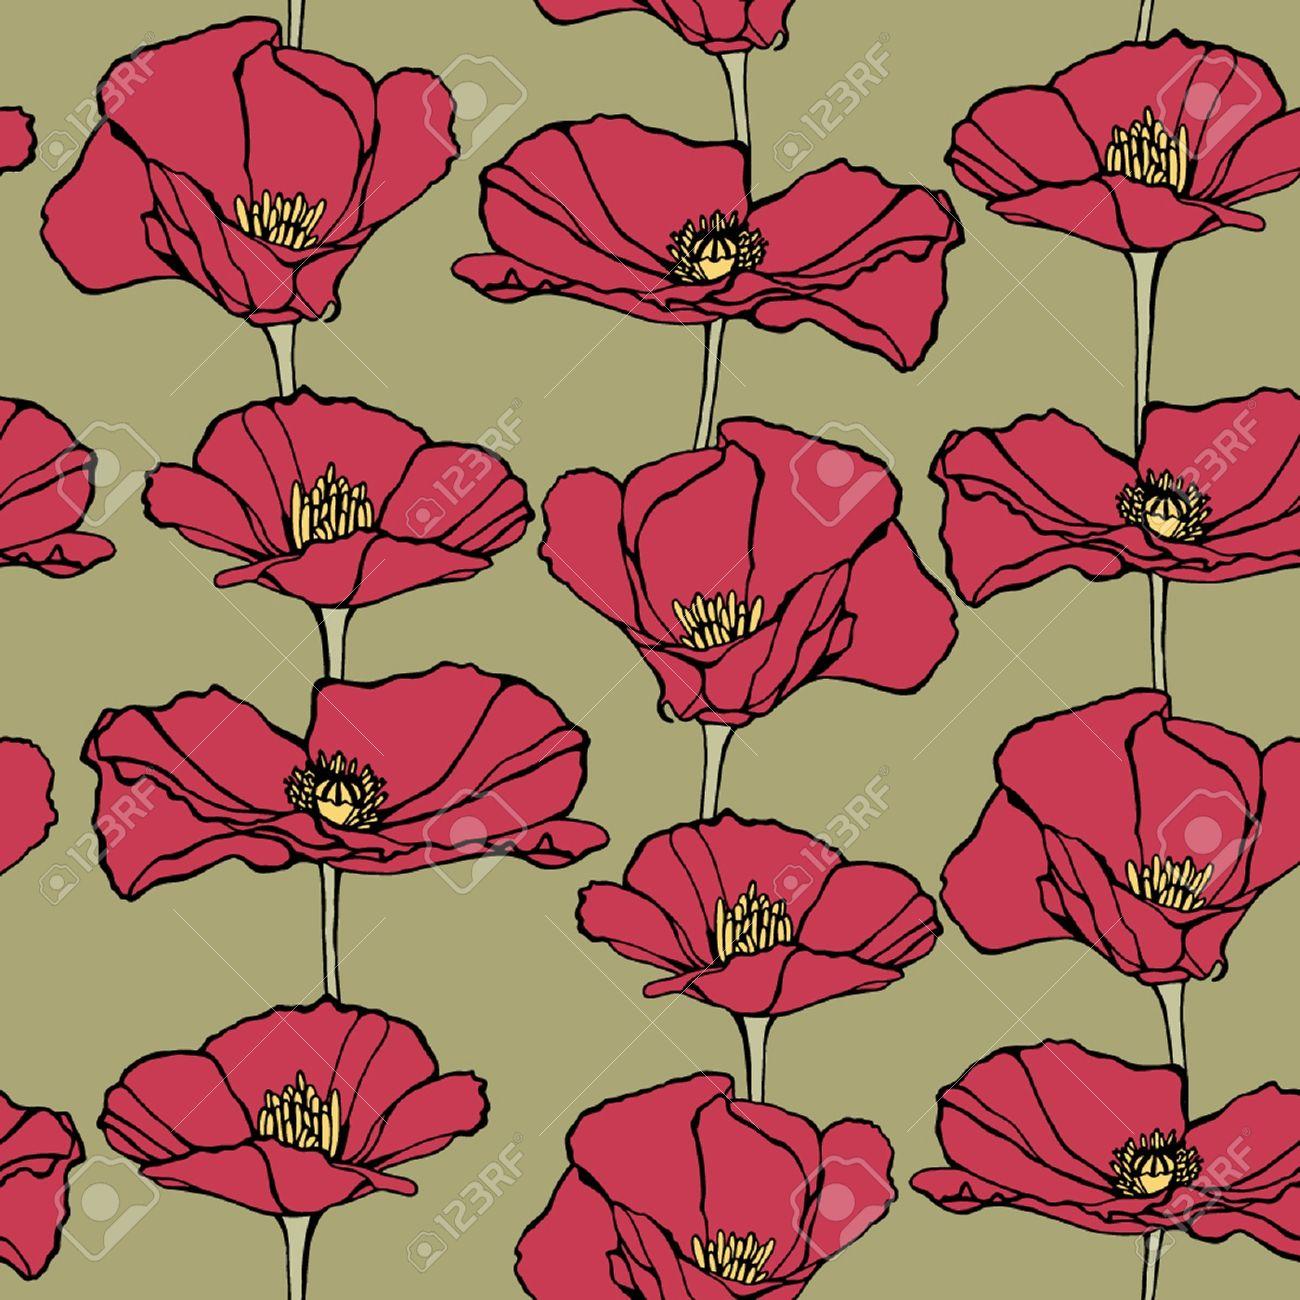 Elegance seamless pattern with poppy flowers vector floral elegance seamless pattern with poppy flowers vector floral illustration in vintage style stock vector mightylinksfo